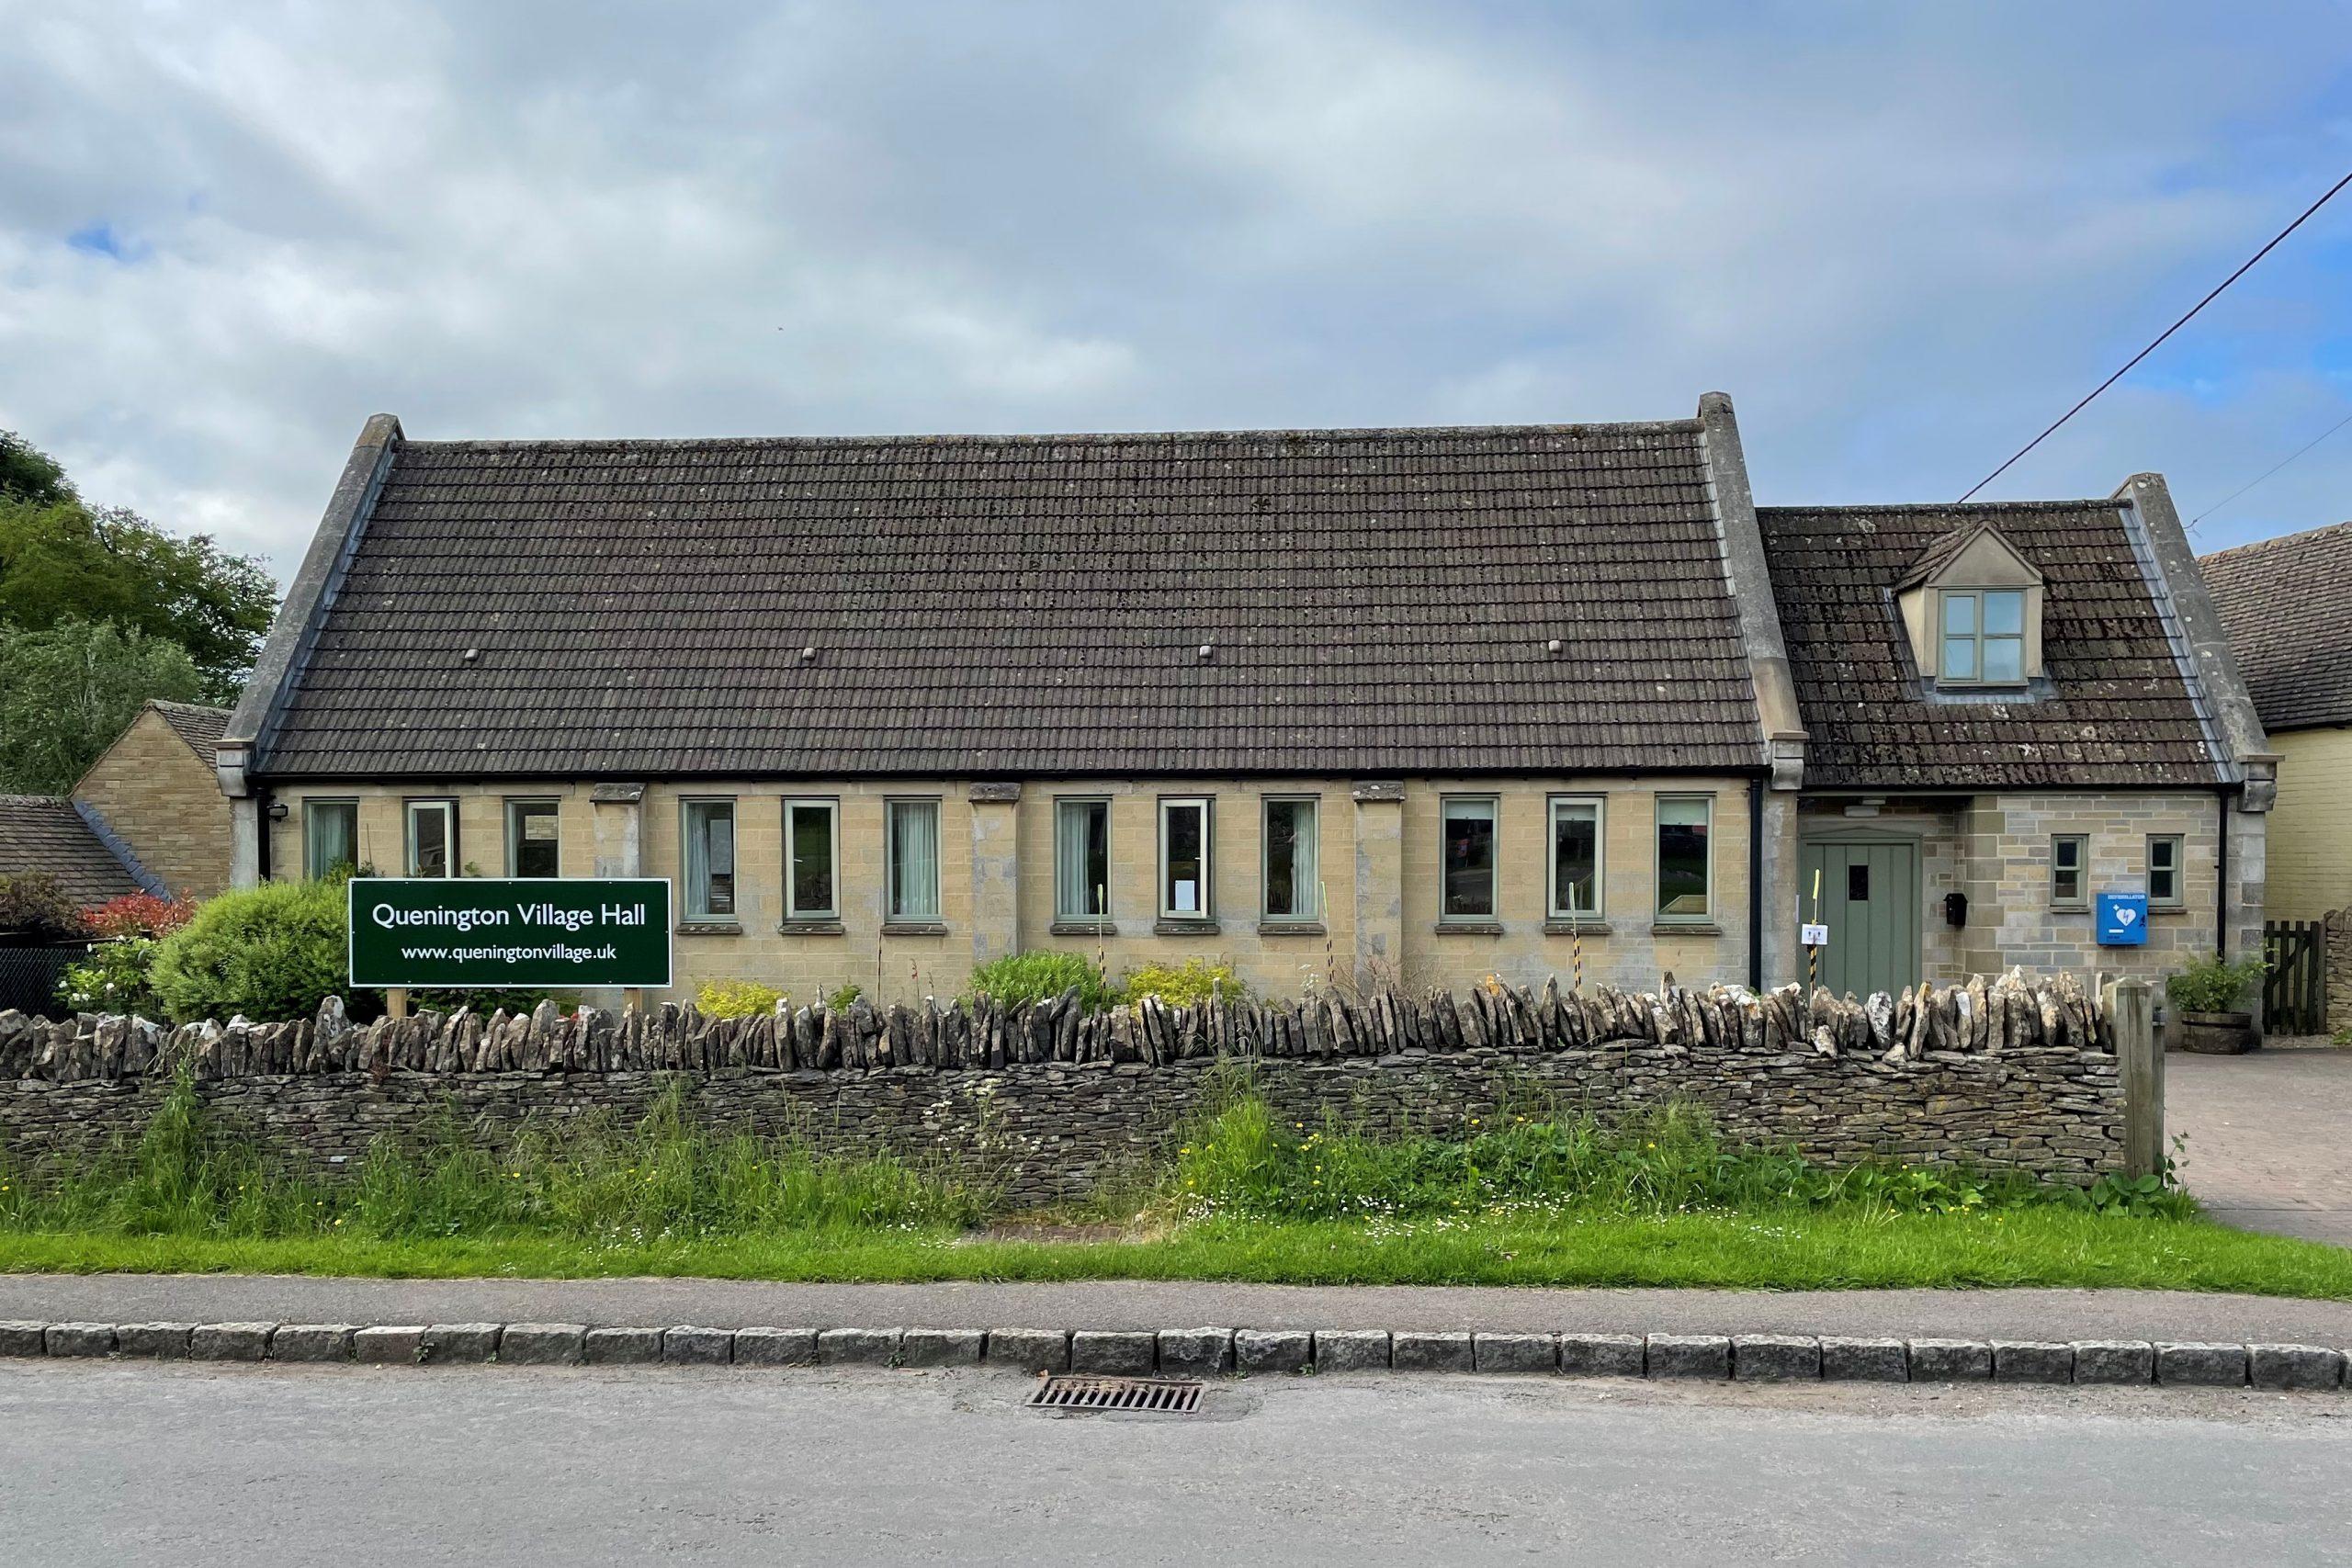 Quenington Village Hall